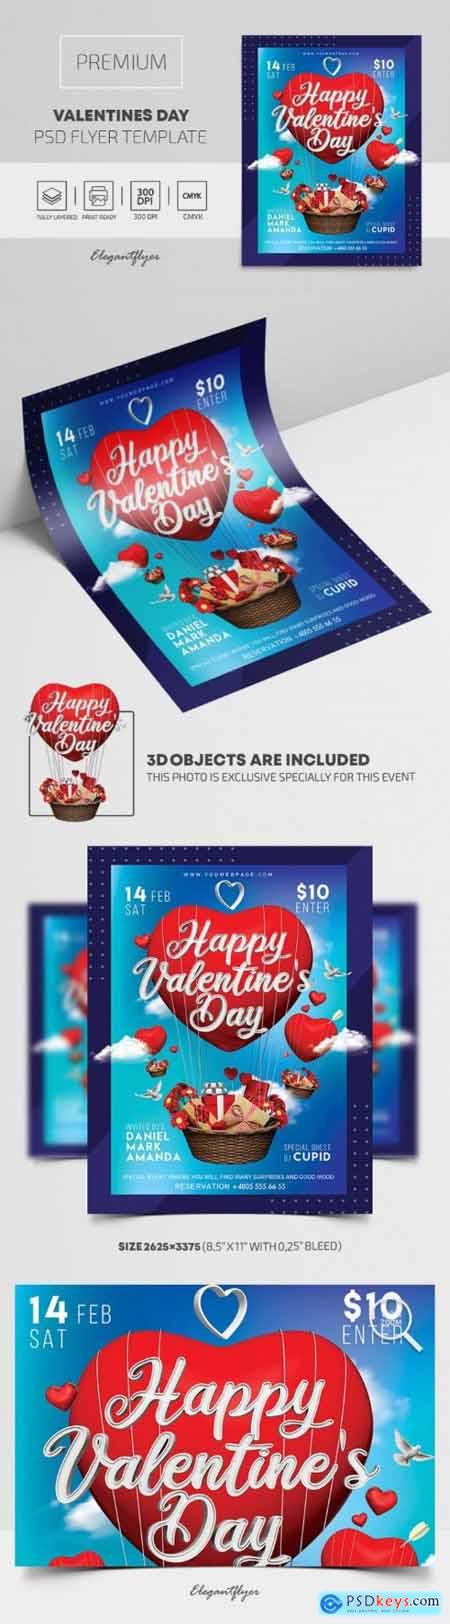 Valentines Day – Premium PSD Flyer Template